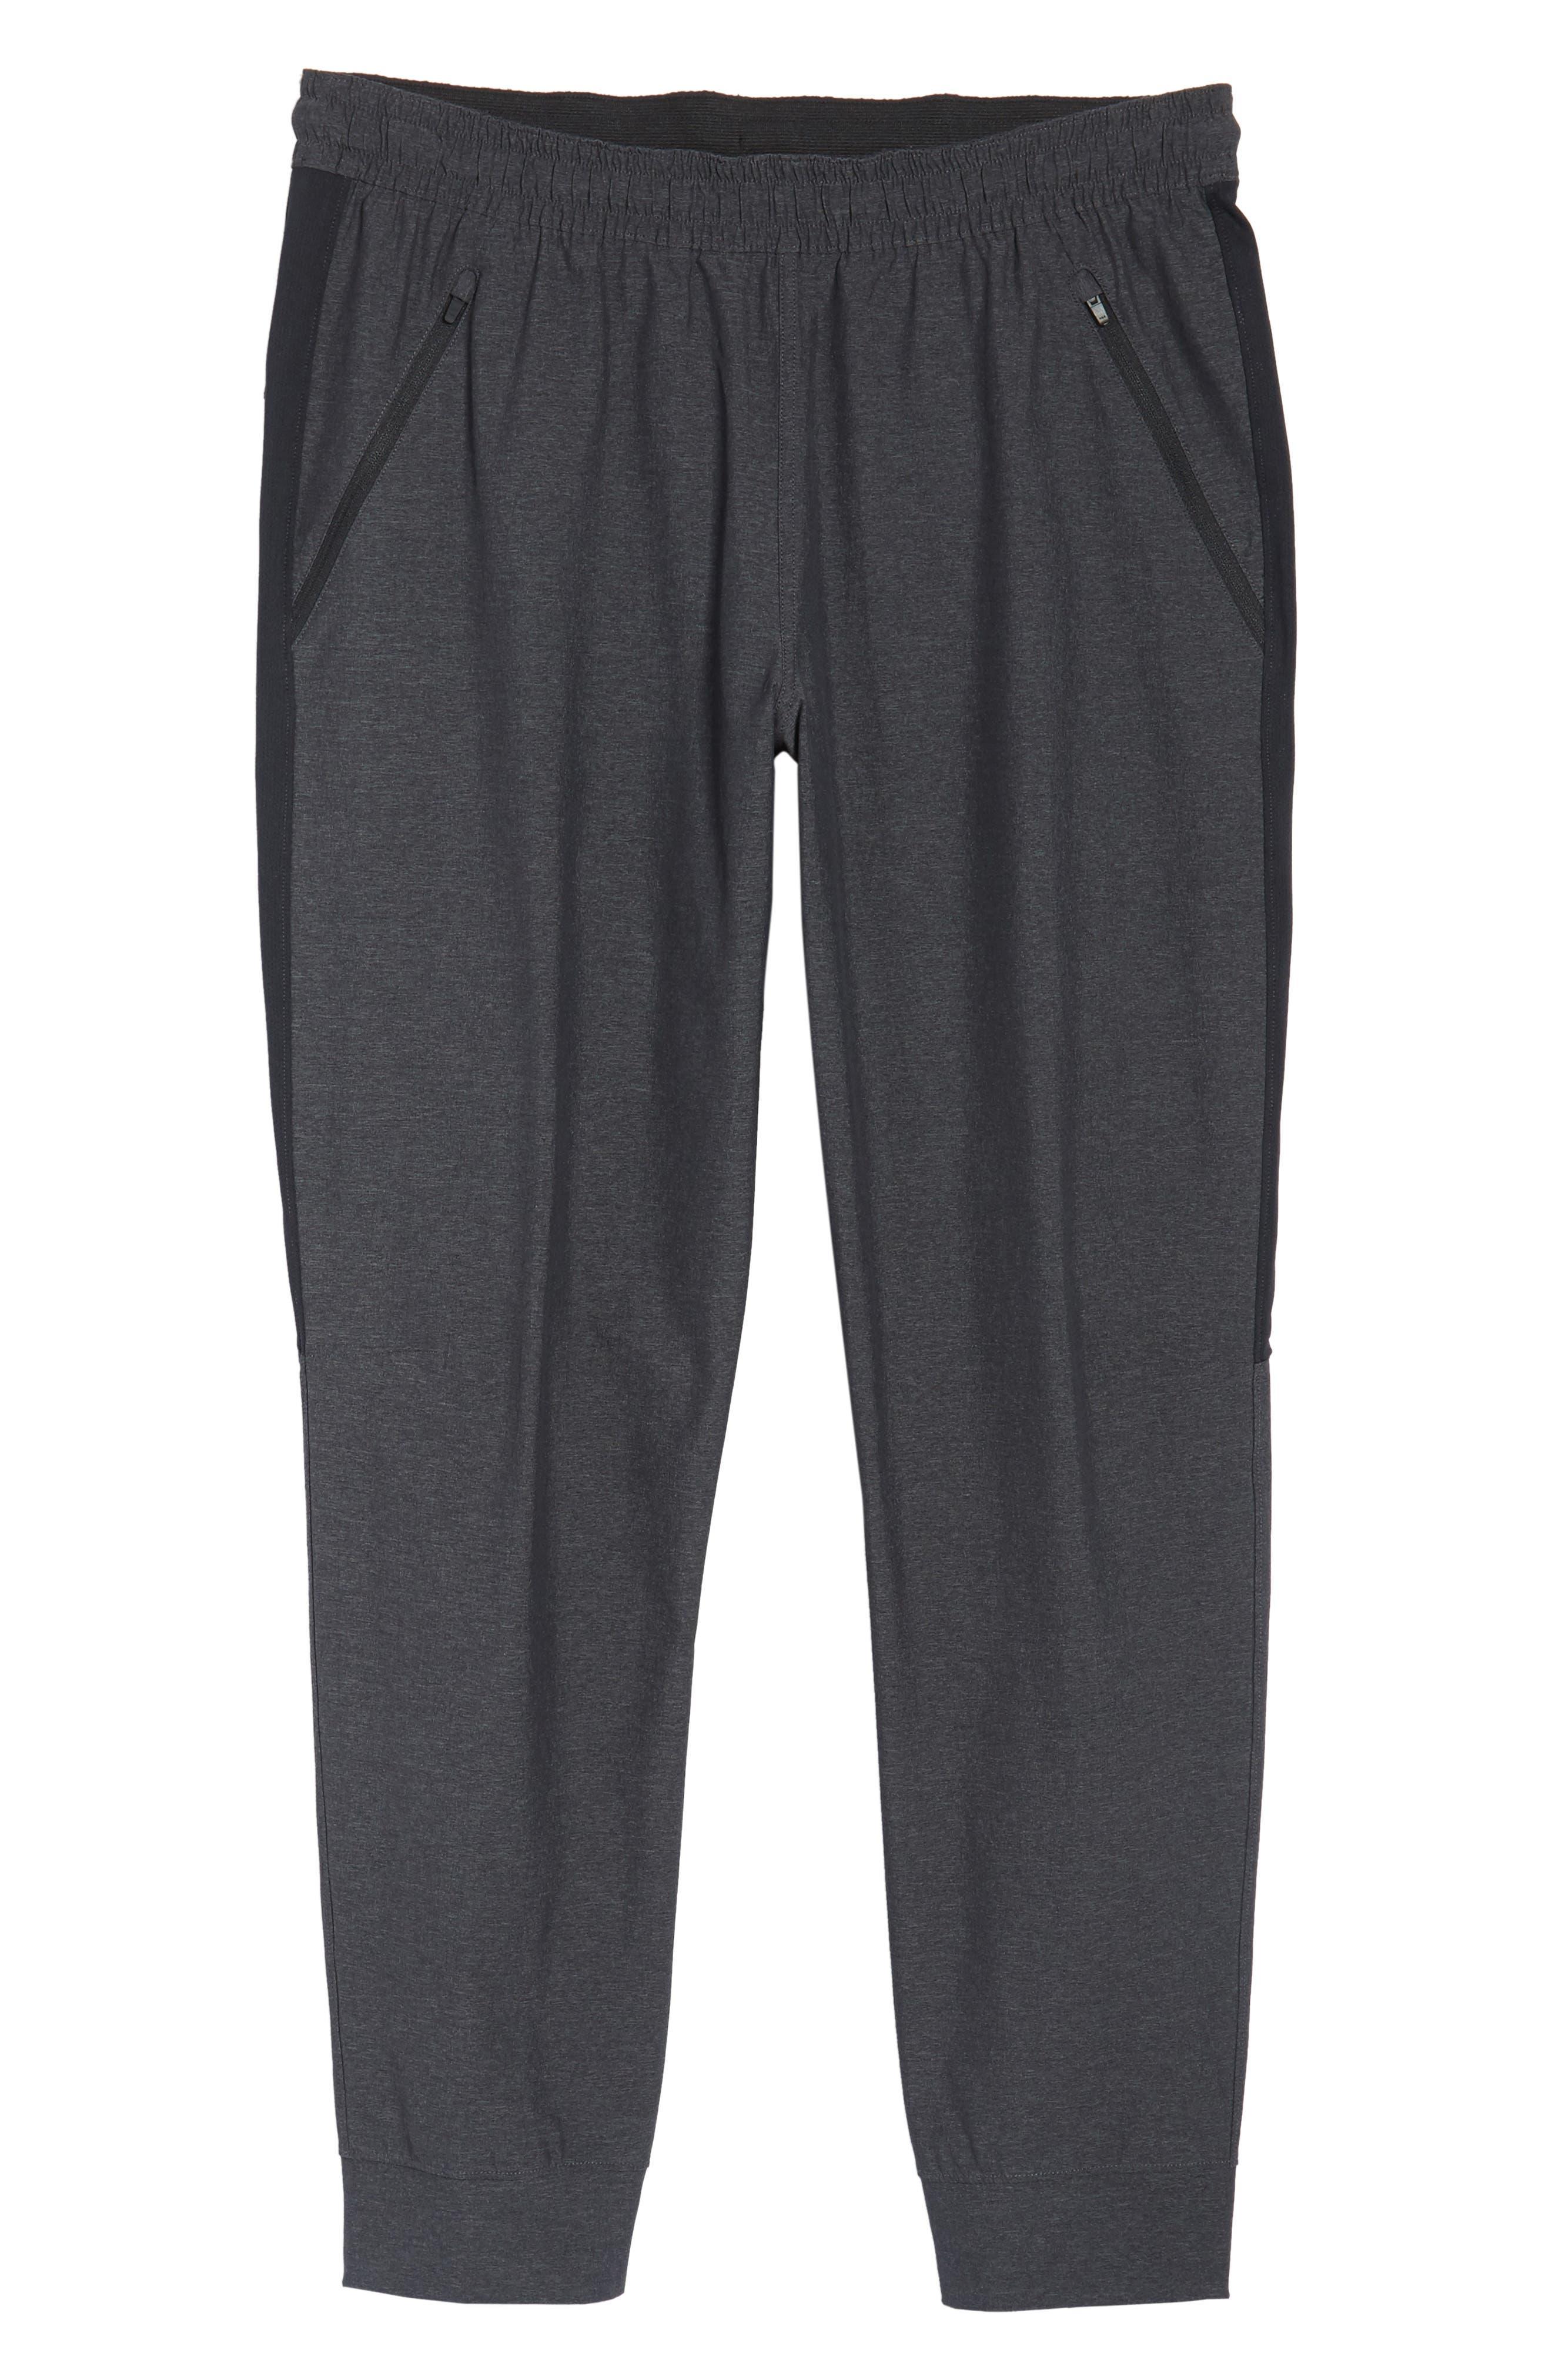 Zip Pocket Sweatpants,                             Alternate thumbnail 6, color,                             Grey Ebony Melange